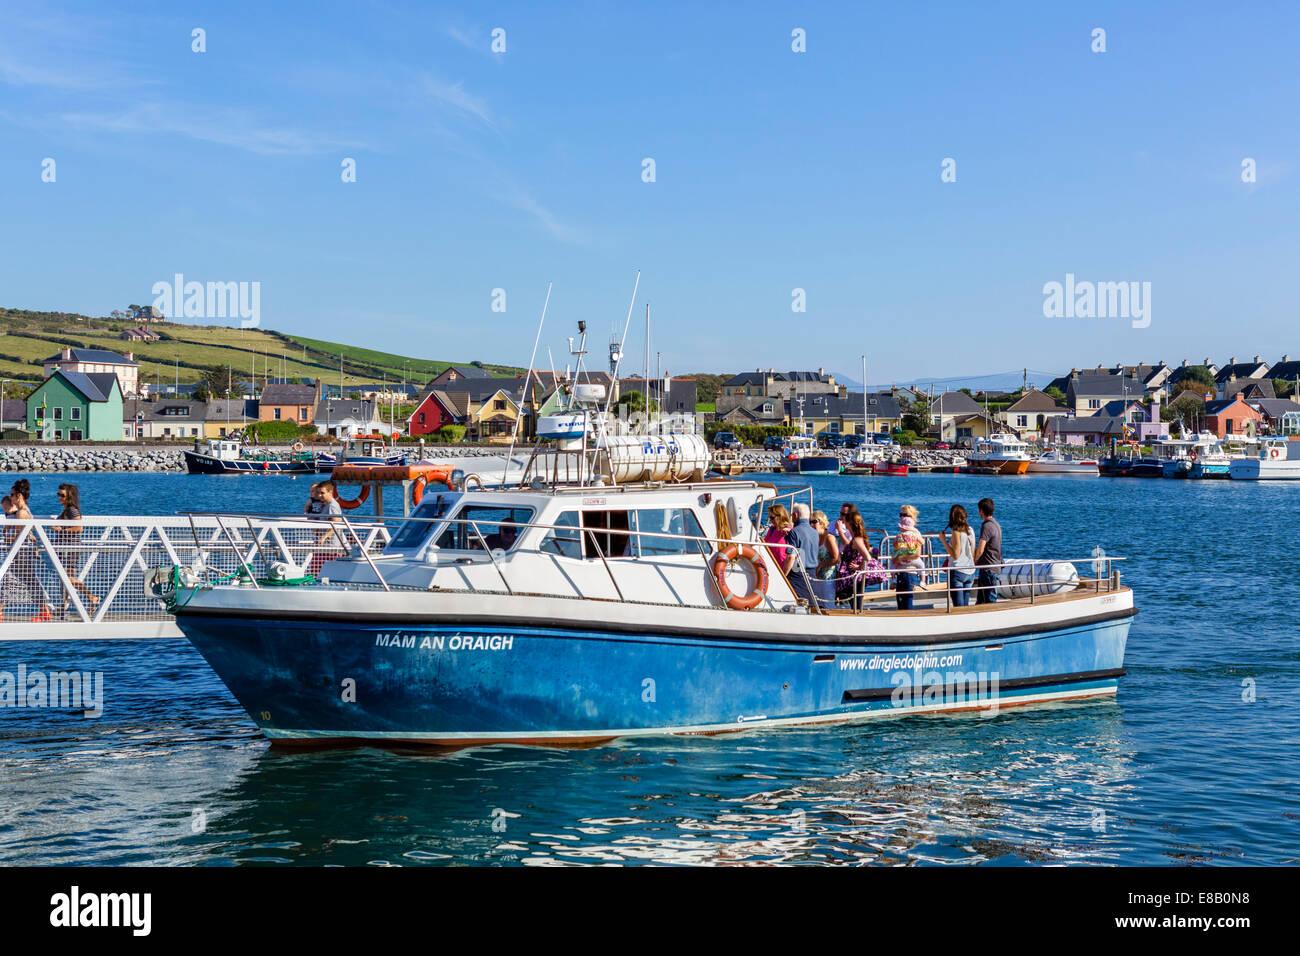 Turista desembarcar desde un viaje de turismo, Delfín Dingle Dingle, la península Dingle, Condado de Kerry, Imagen De Stock